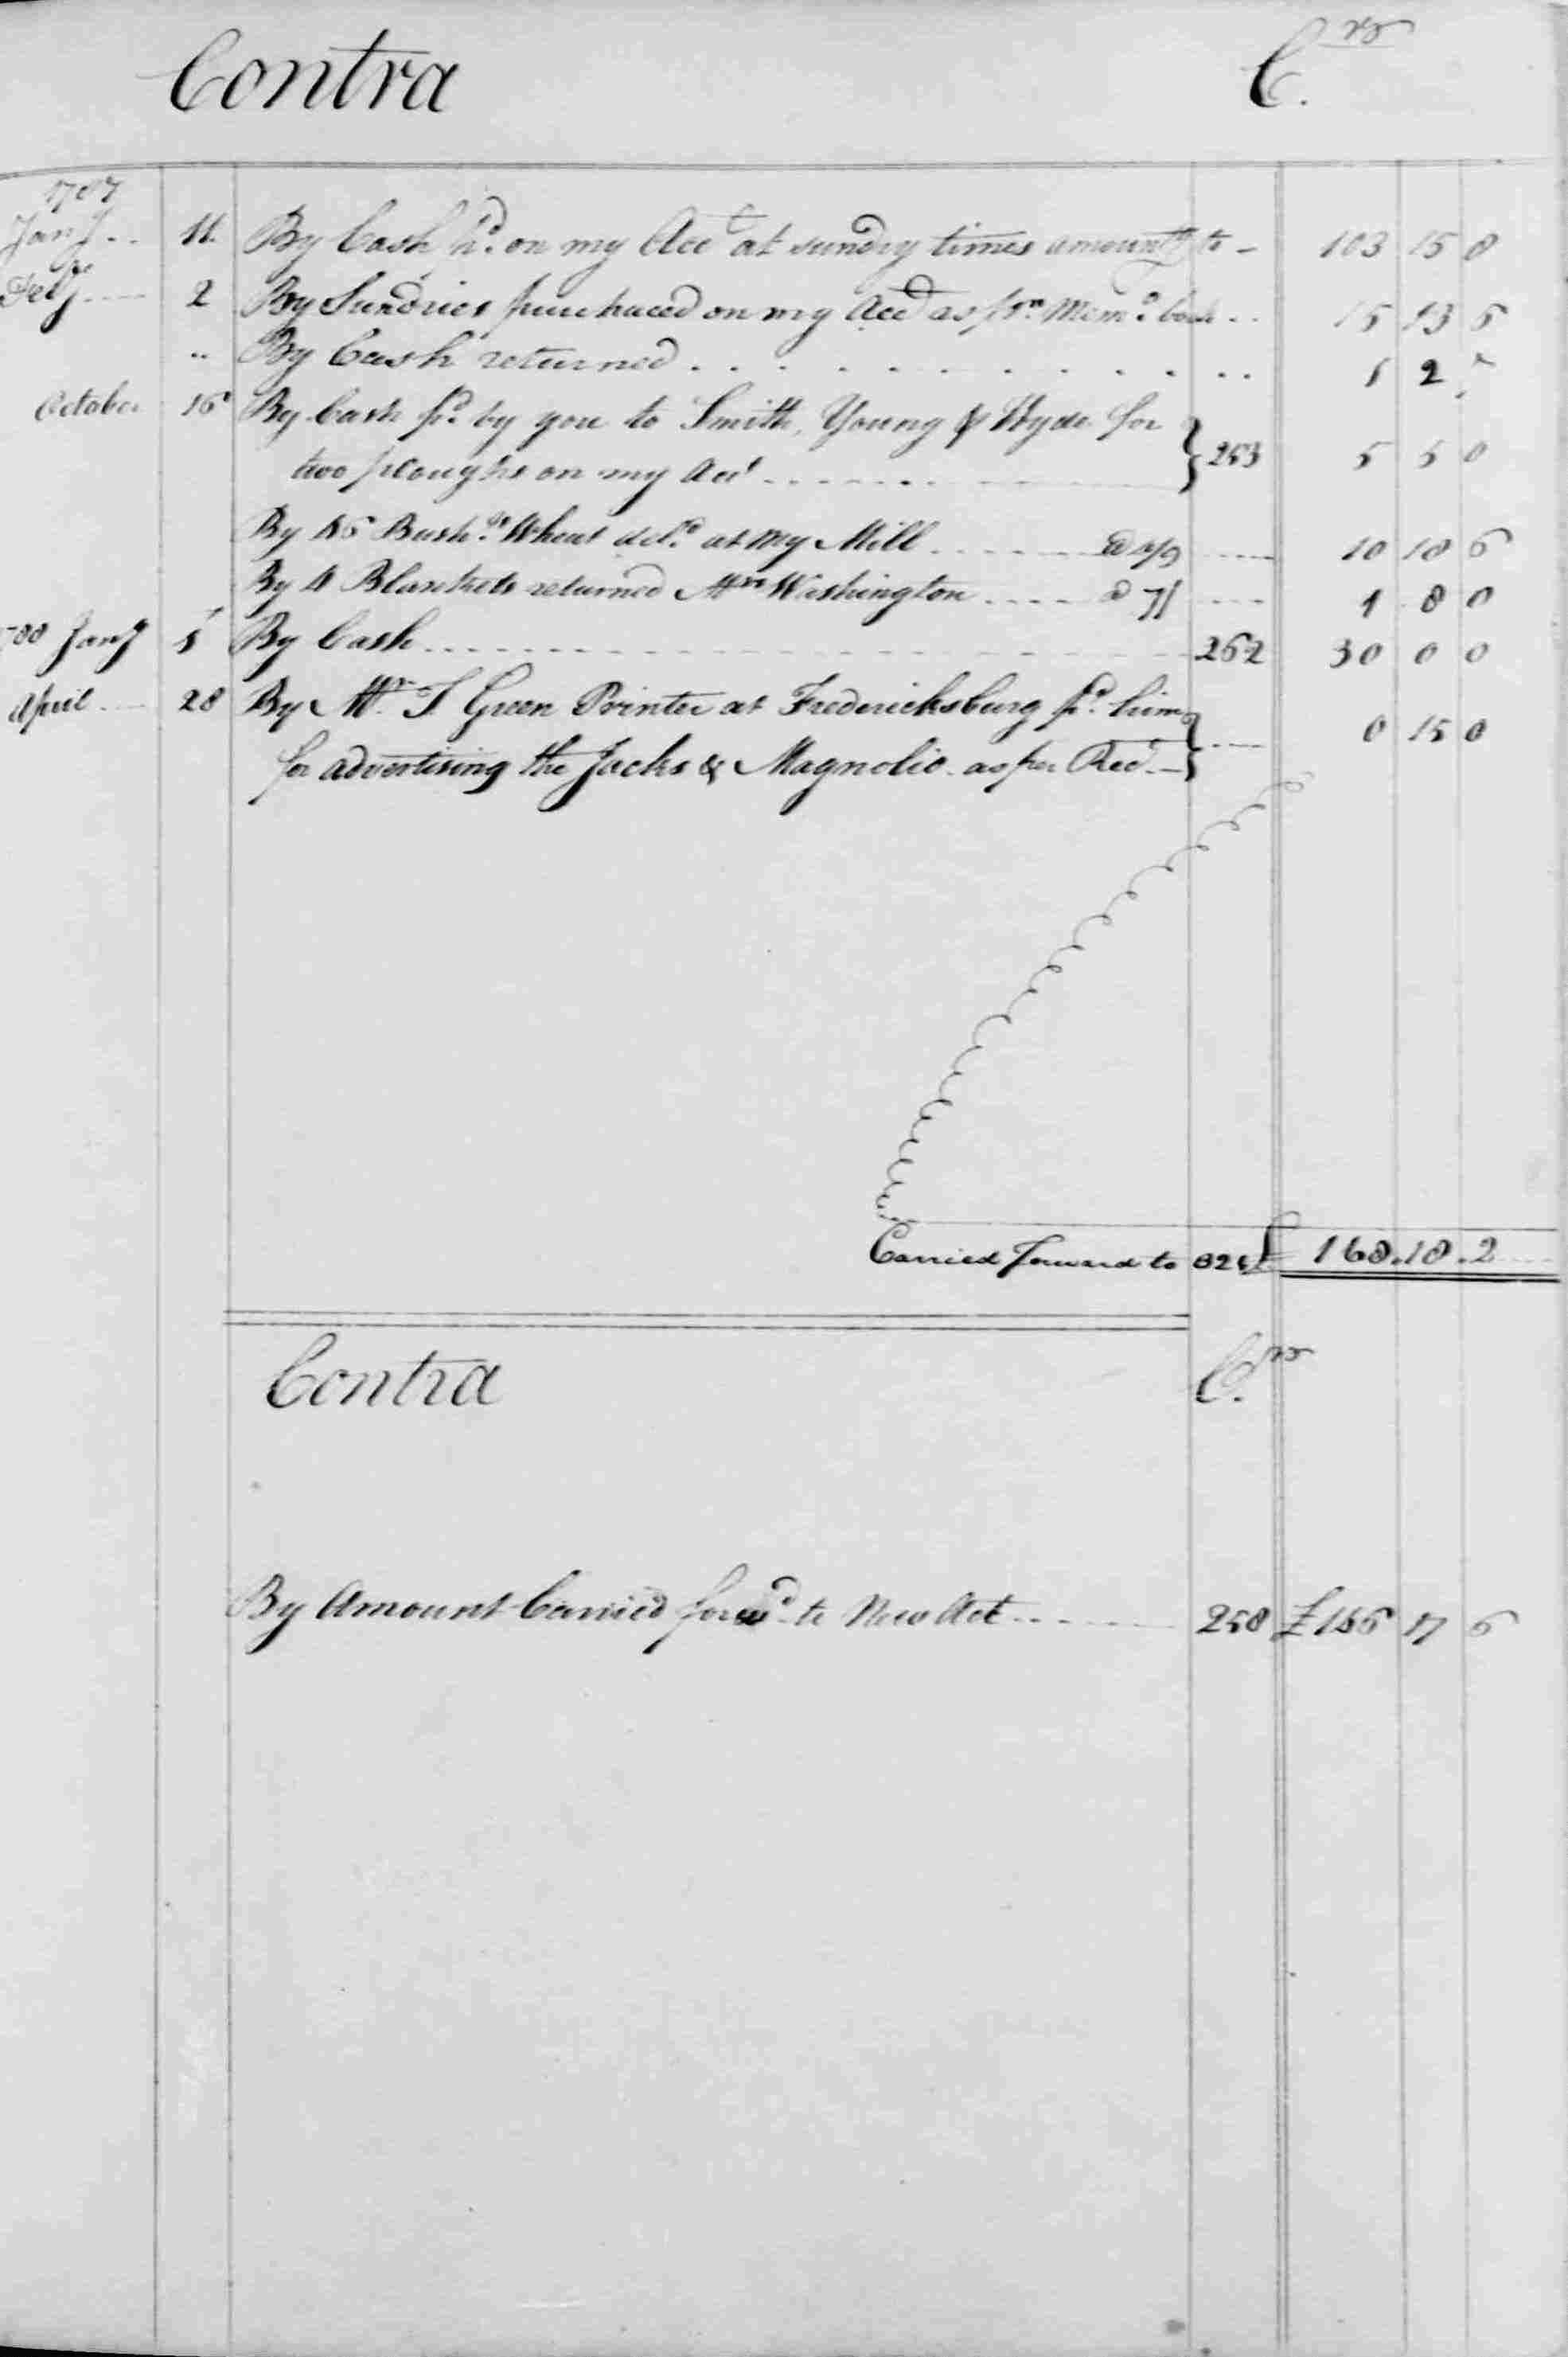 Ledger B, folio 241, right side